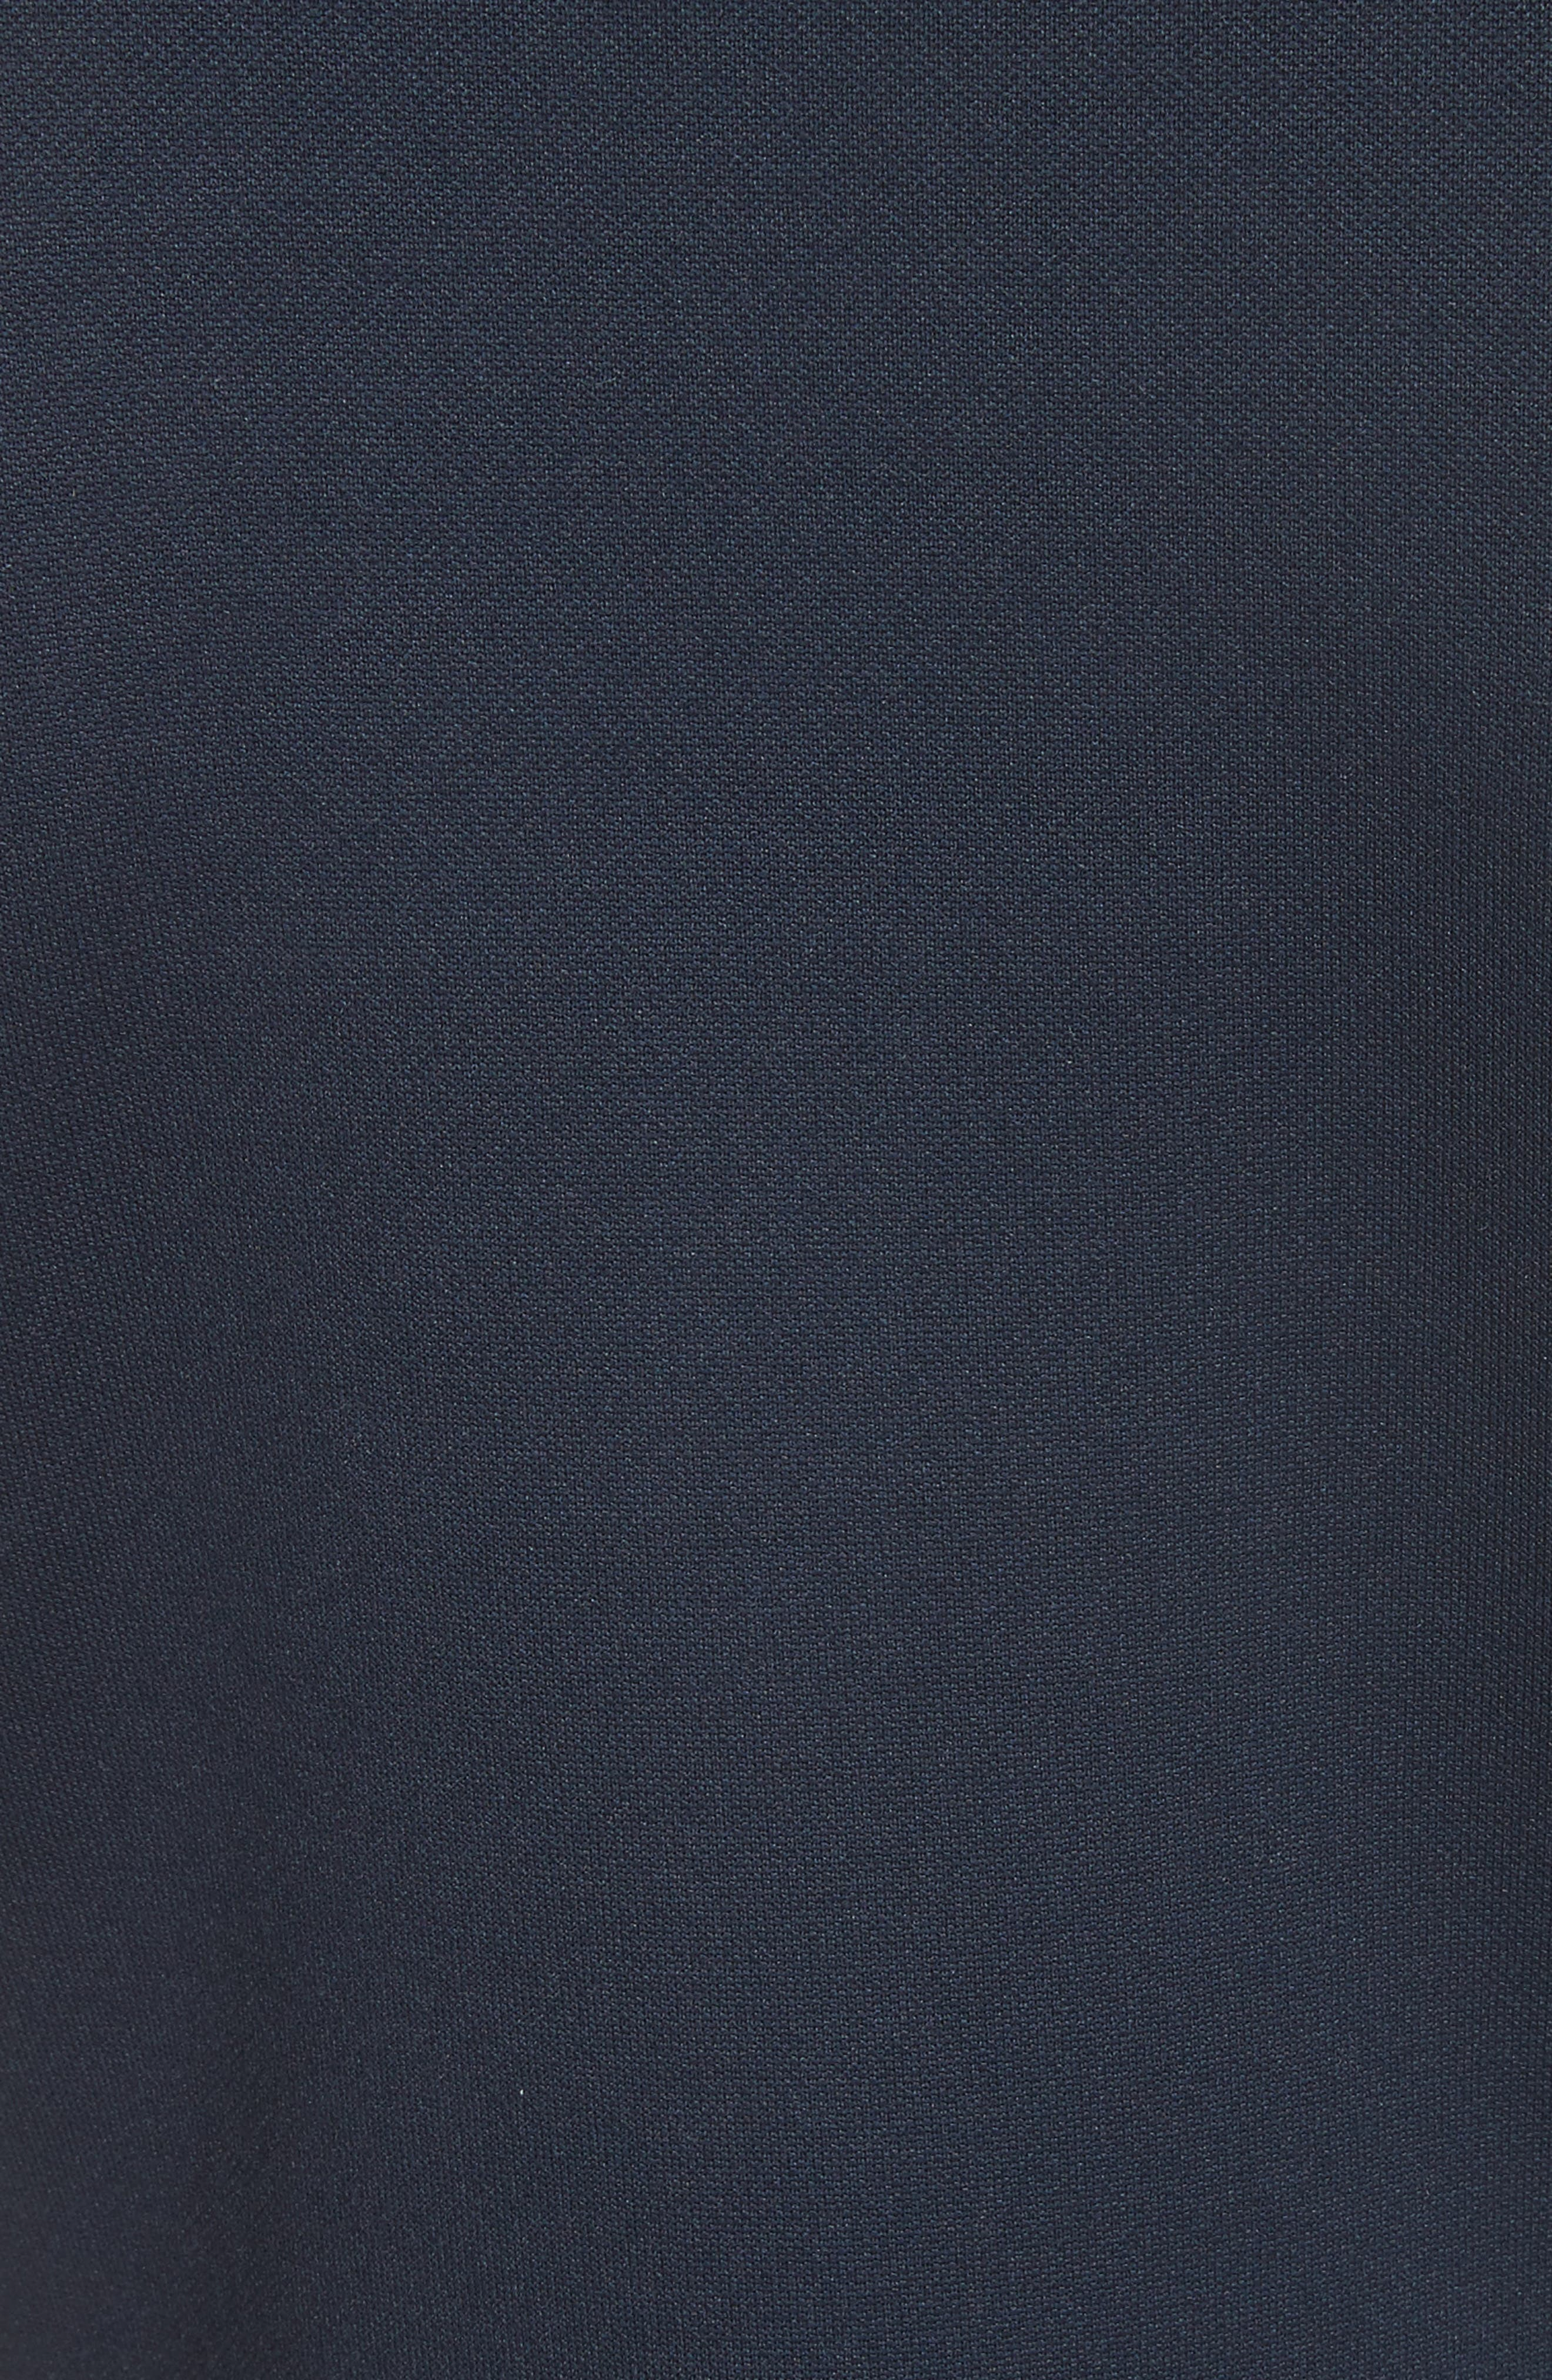 Sleeveless Track Dress,                             Alternate thumbnail 5, color,                             TORY NAVY